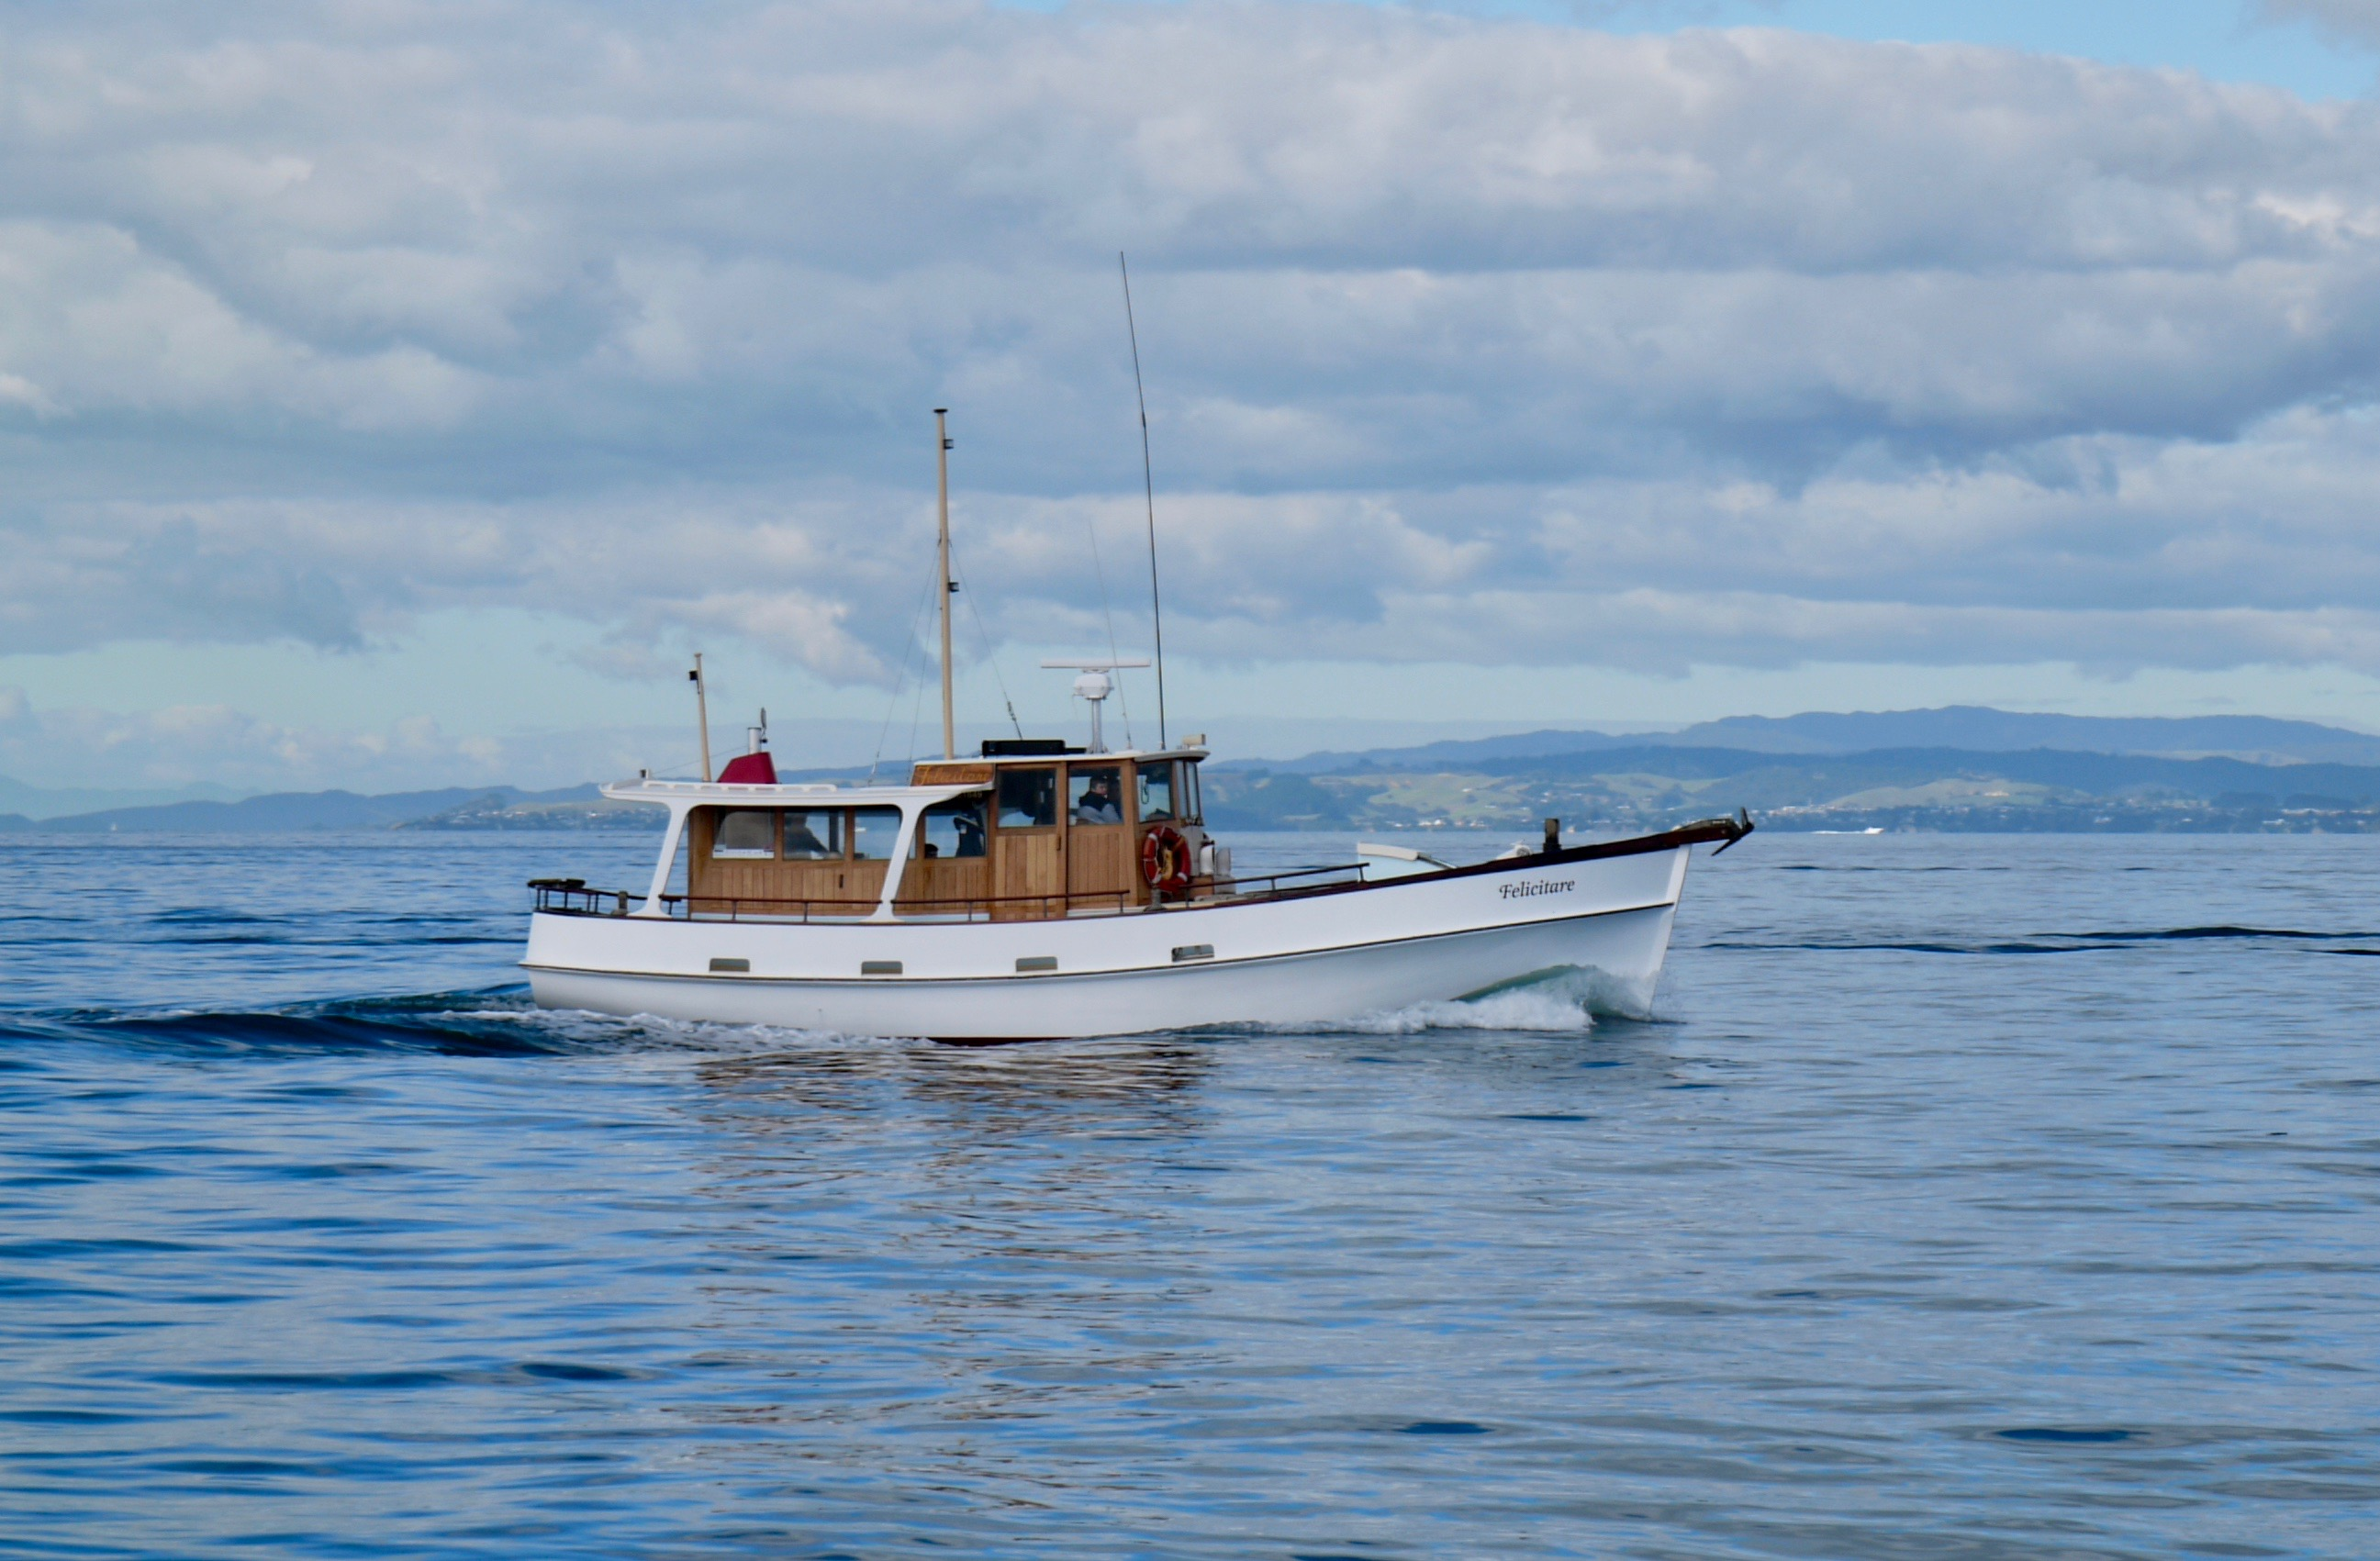 P1250206